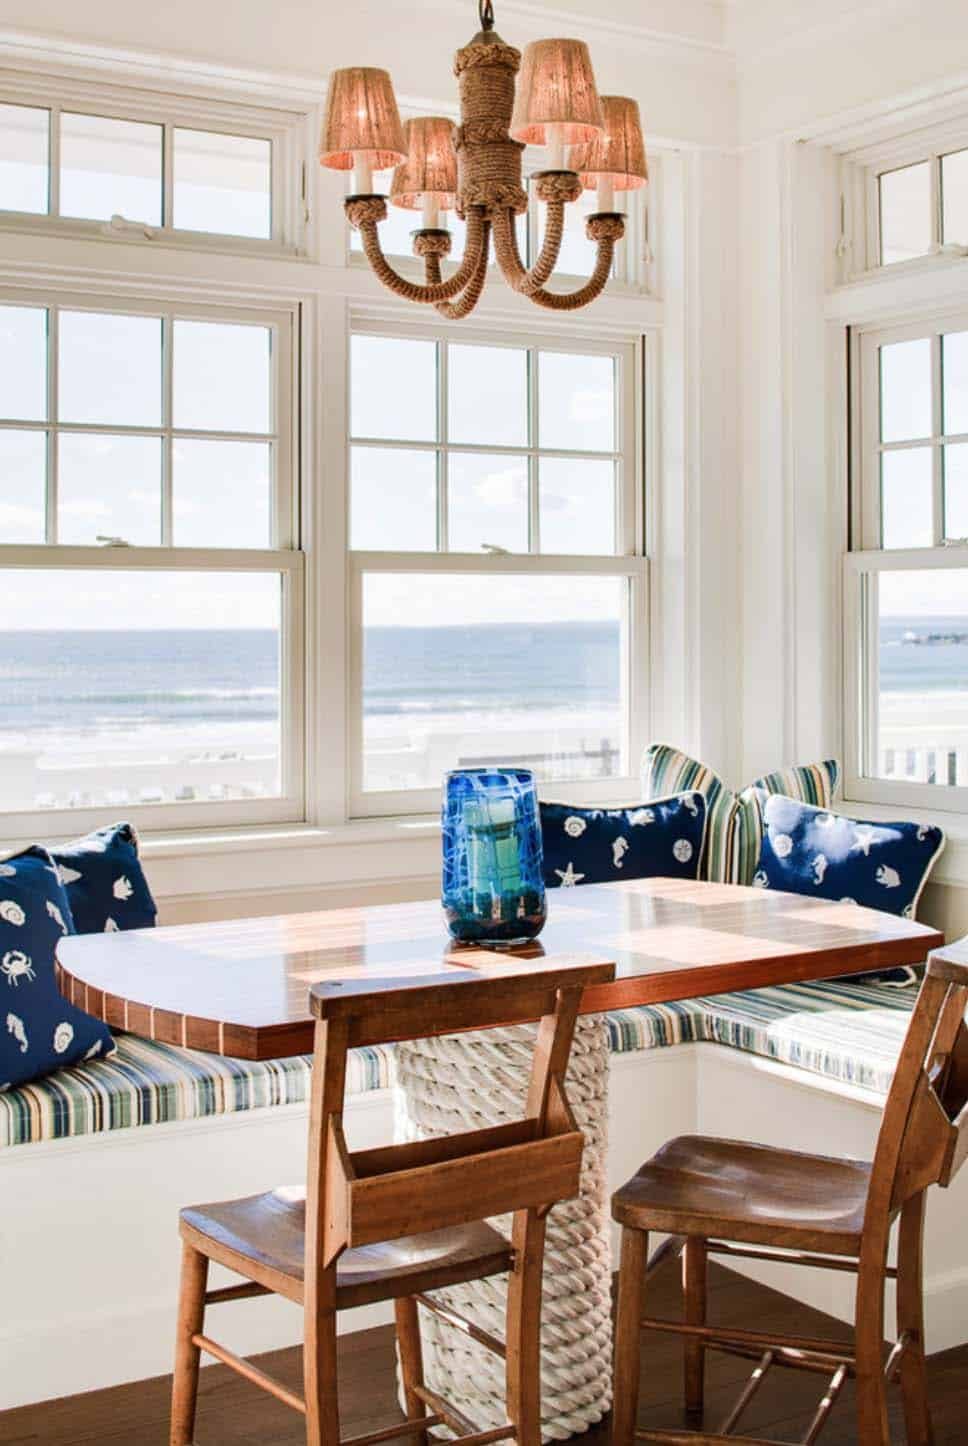 New England Beach House-Hurlbutt Designs-04-1 Kindesign